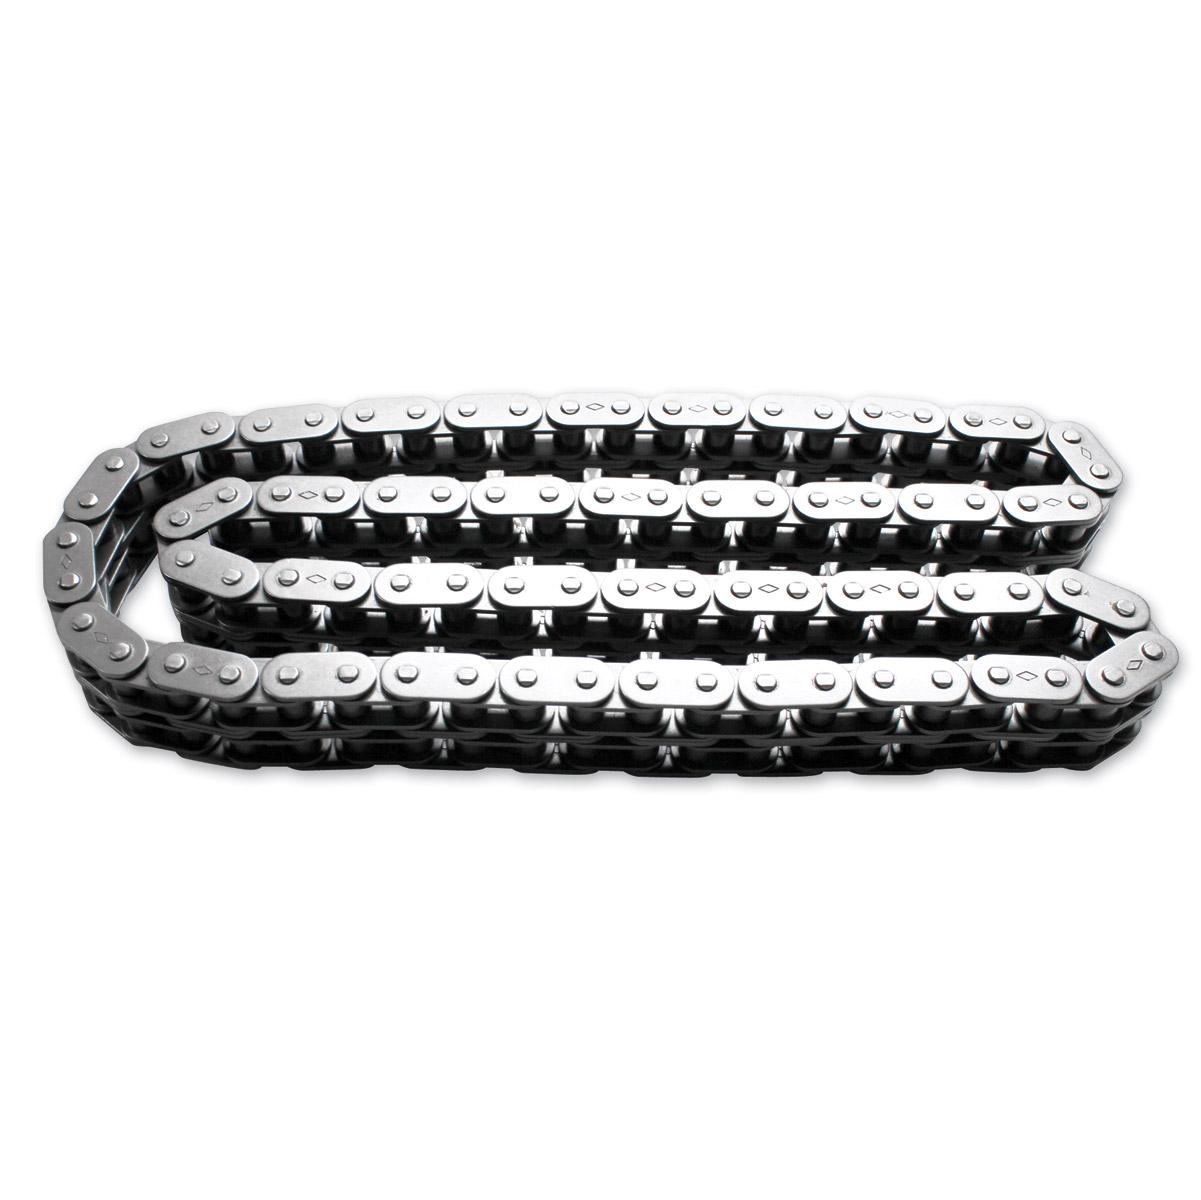 Diamond Chain Company Primary Chain